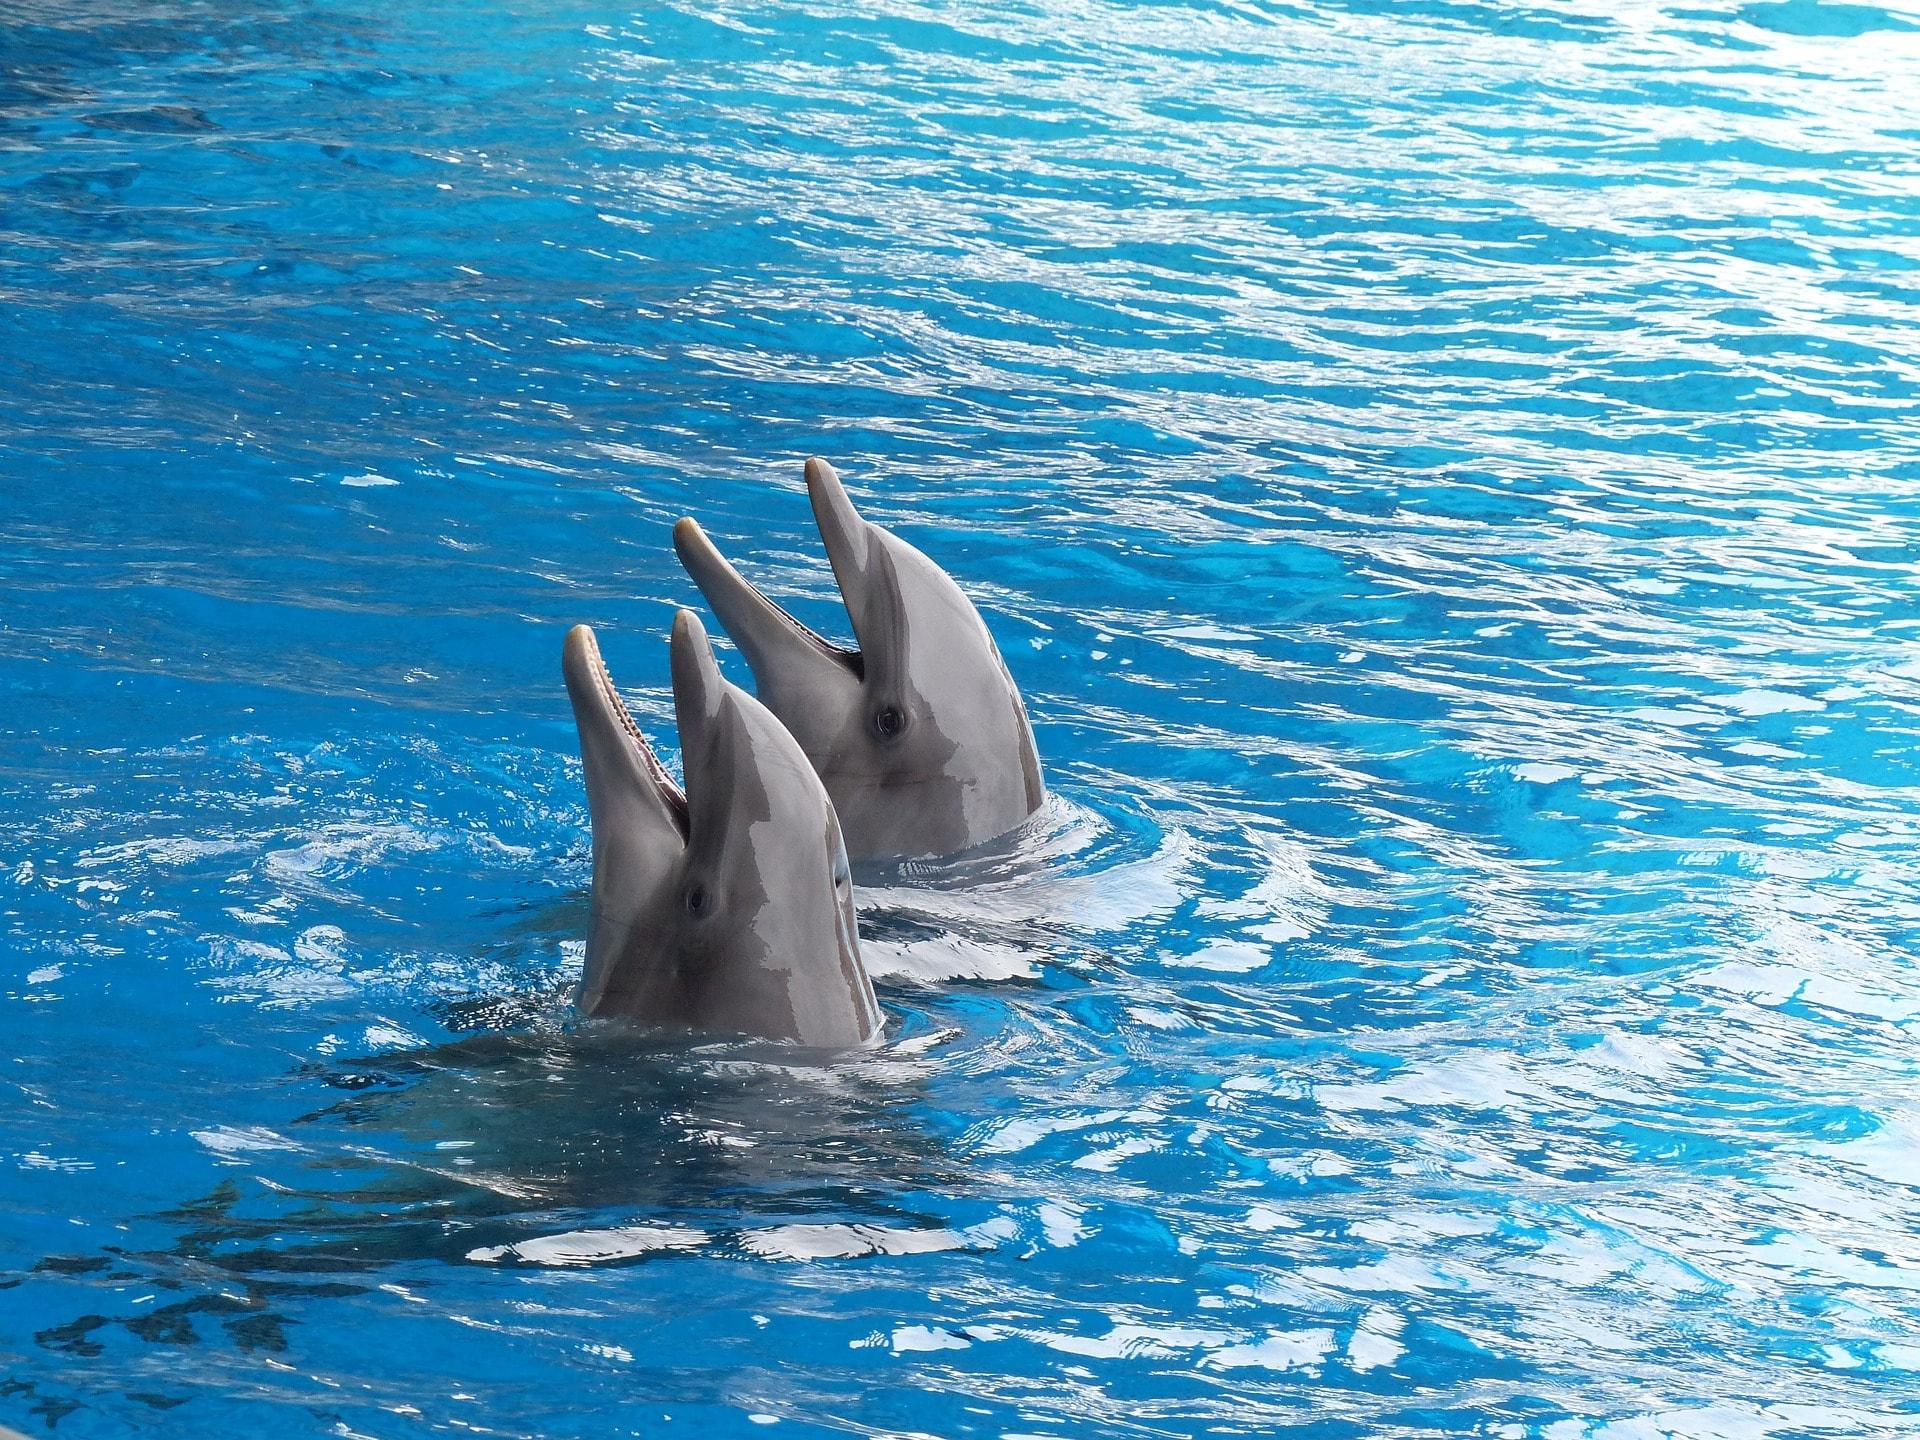 dolphin-2687078_1920